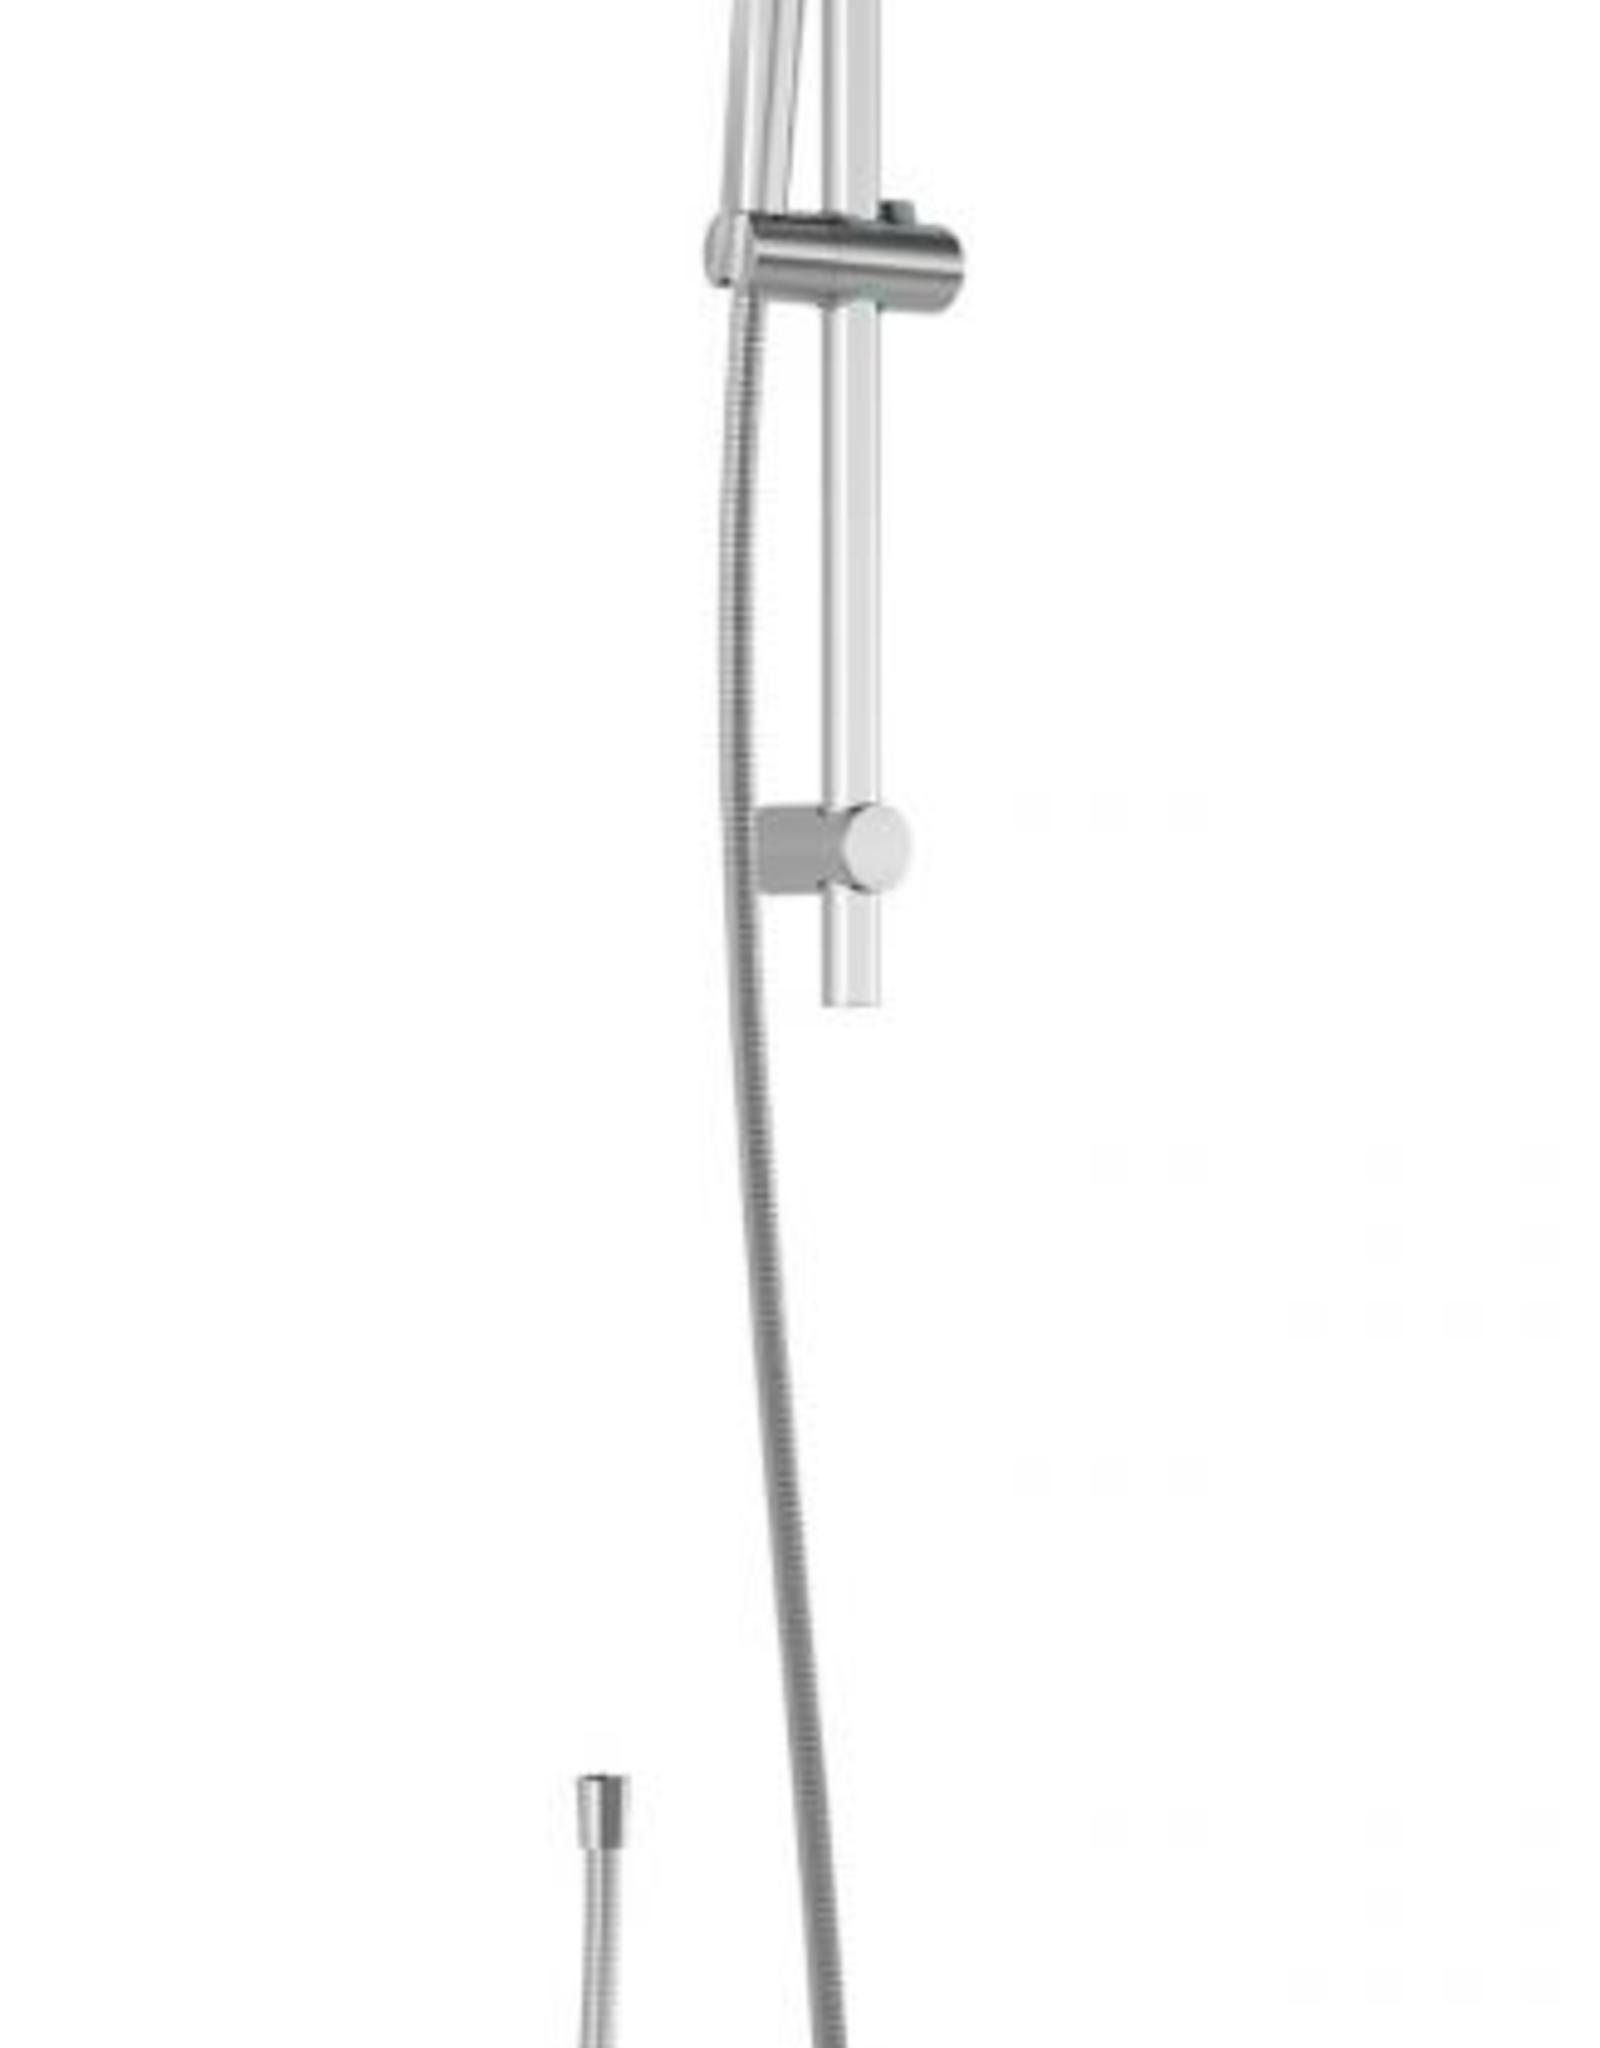 Kalia Kalia Basico PB6- Hand Shower w/ Diverter Tub Spout- Chrome